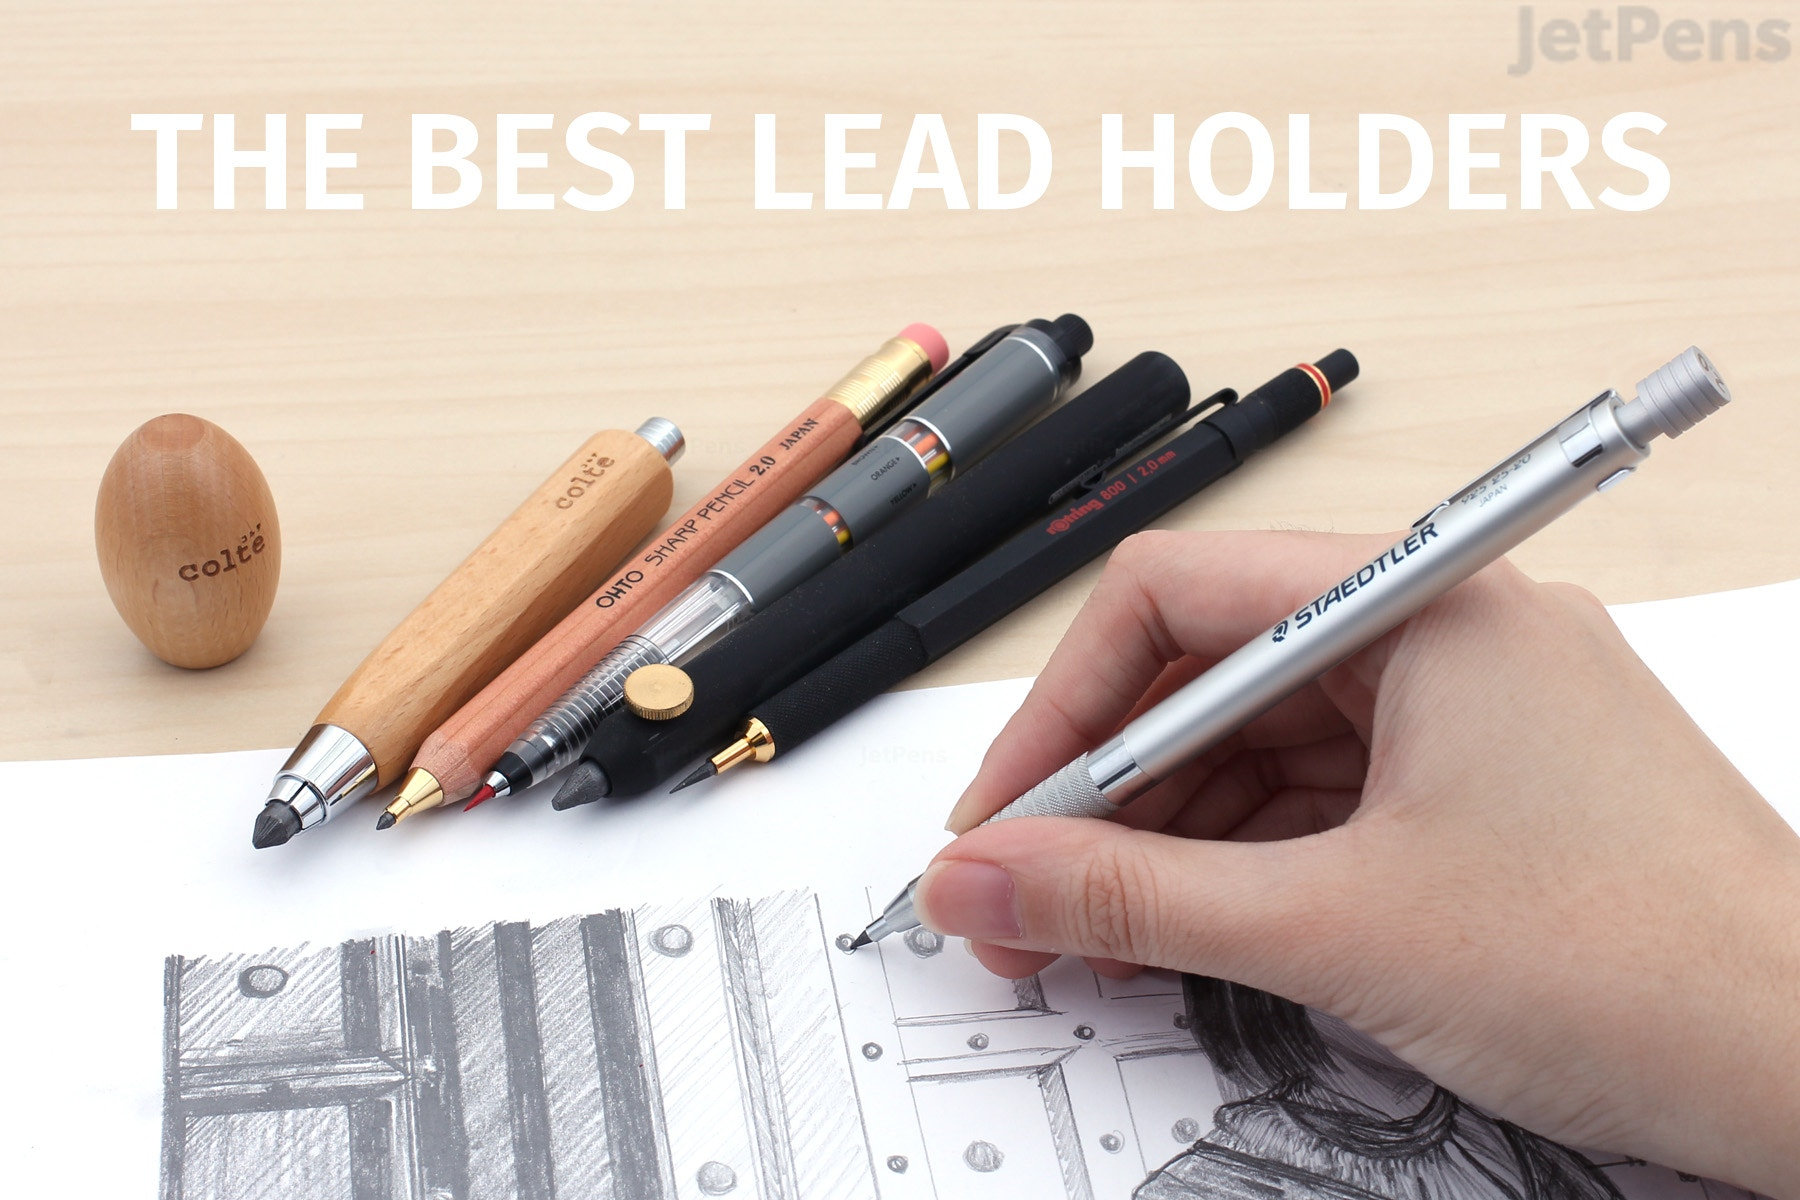 The best lead holders jetpens